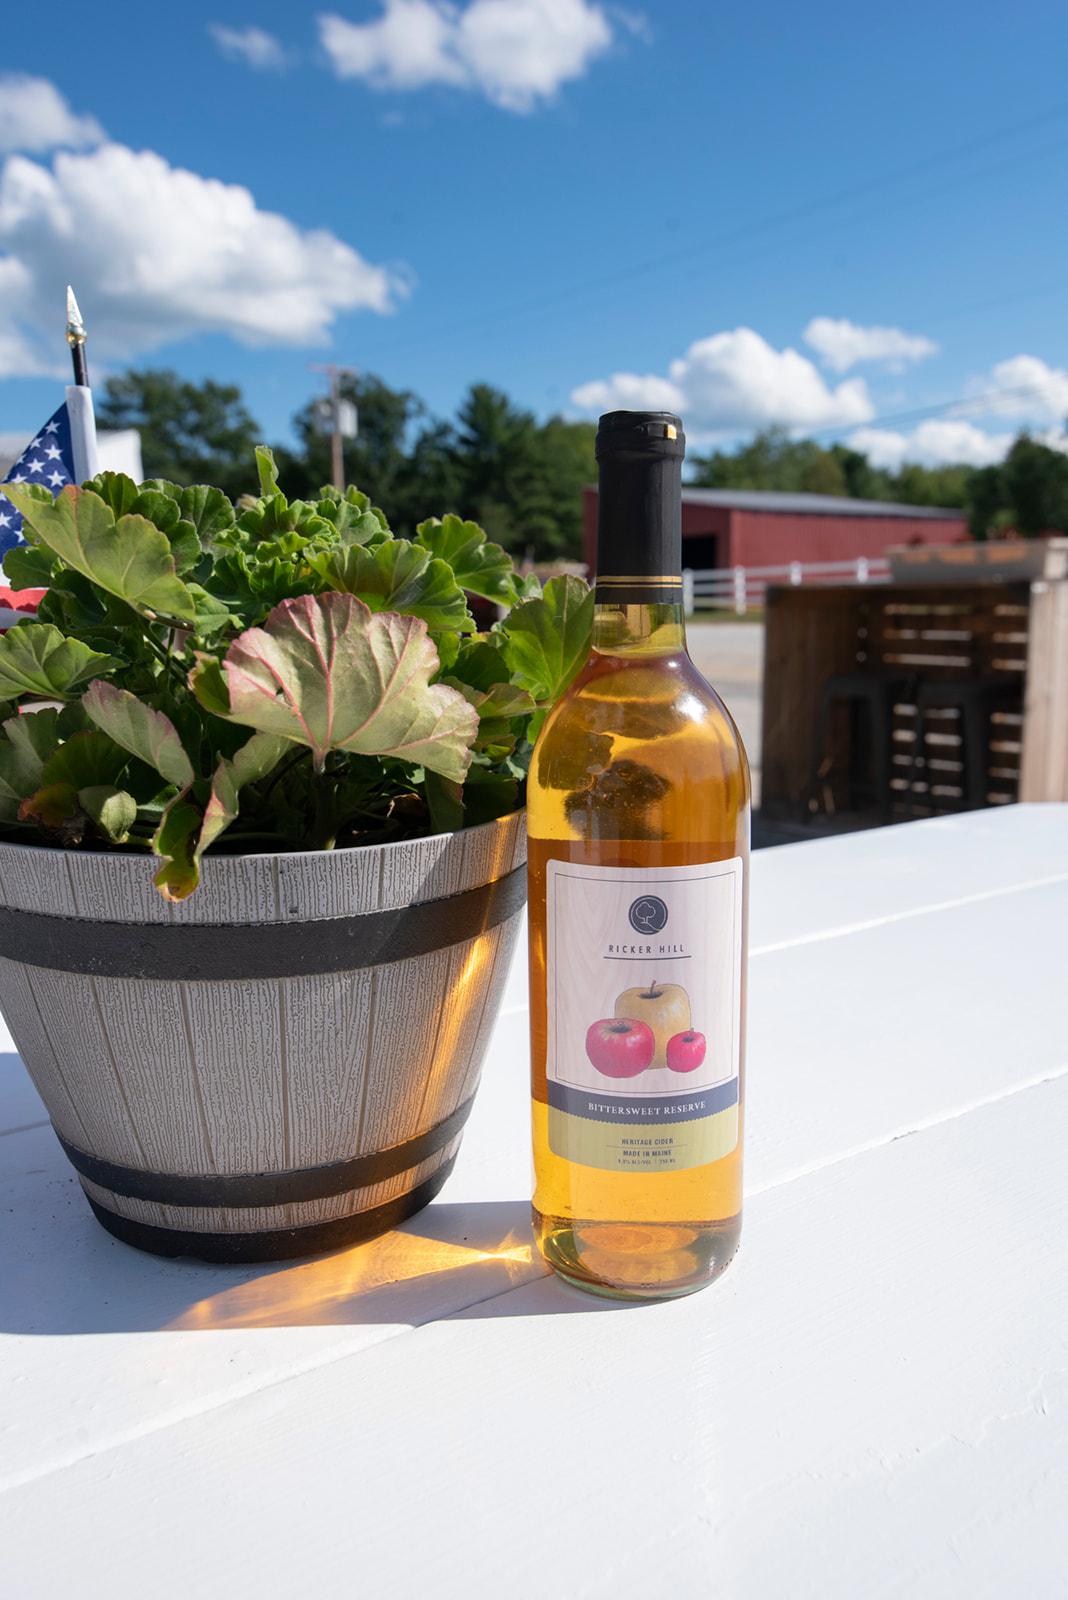 Ricker Hill Bittersweet Reserve wine